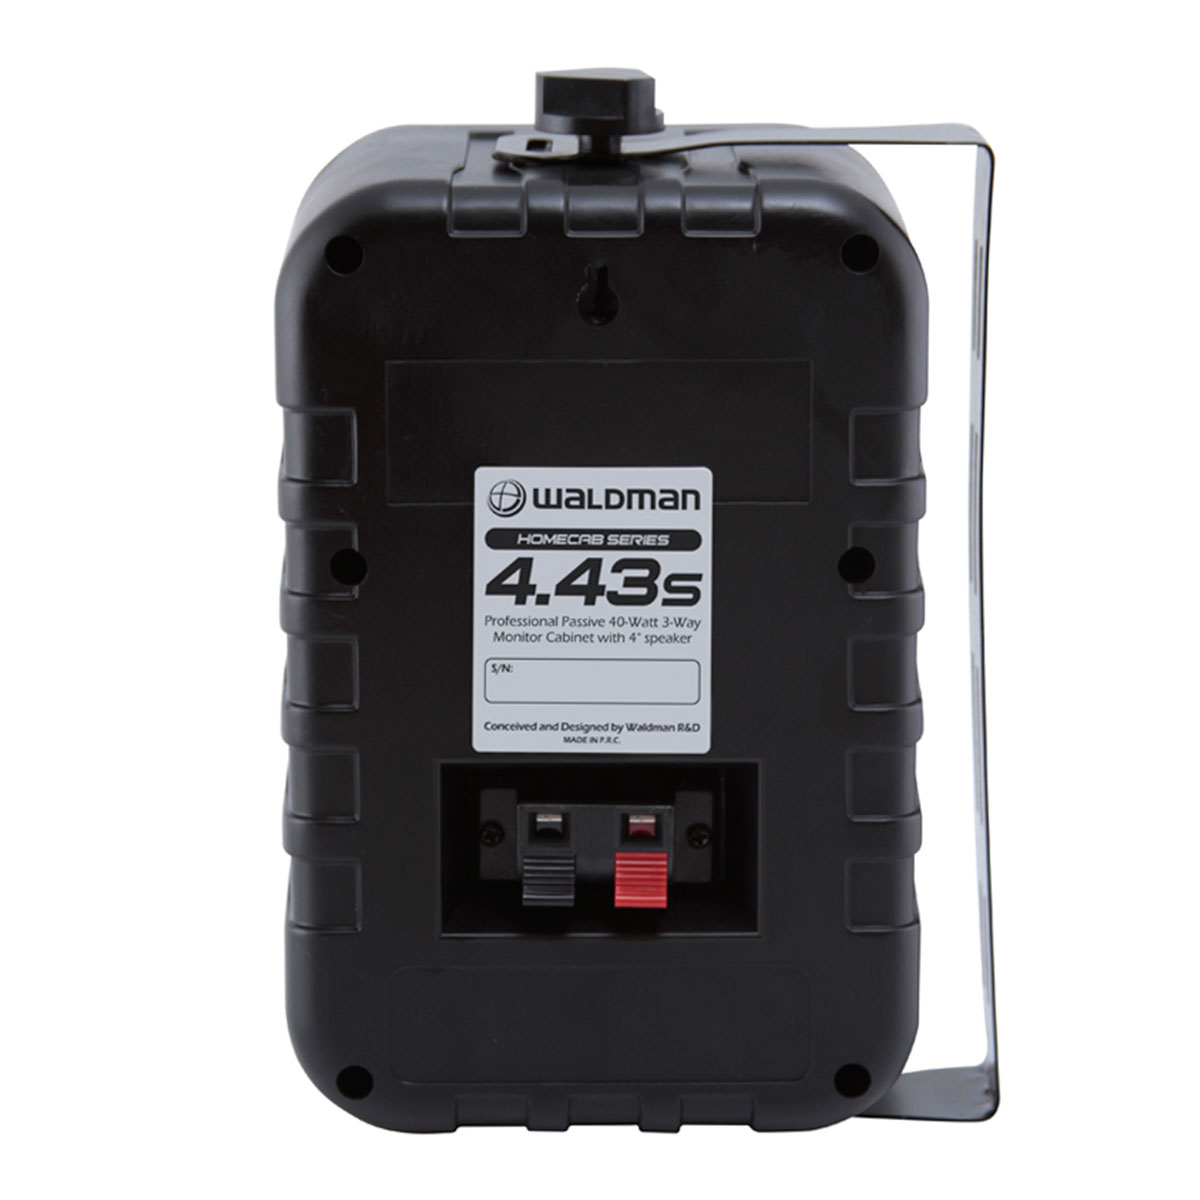 443sBK - Caixa Passiva 40W Preta c/ Suporte ( Par ) Homecab 4 43 S WH - Waldman